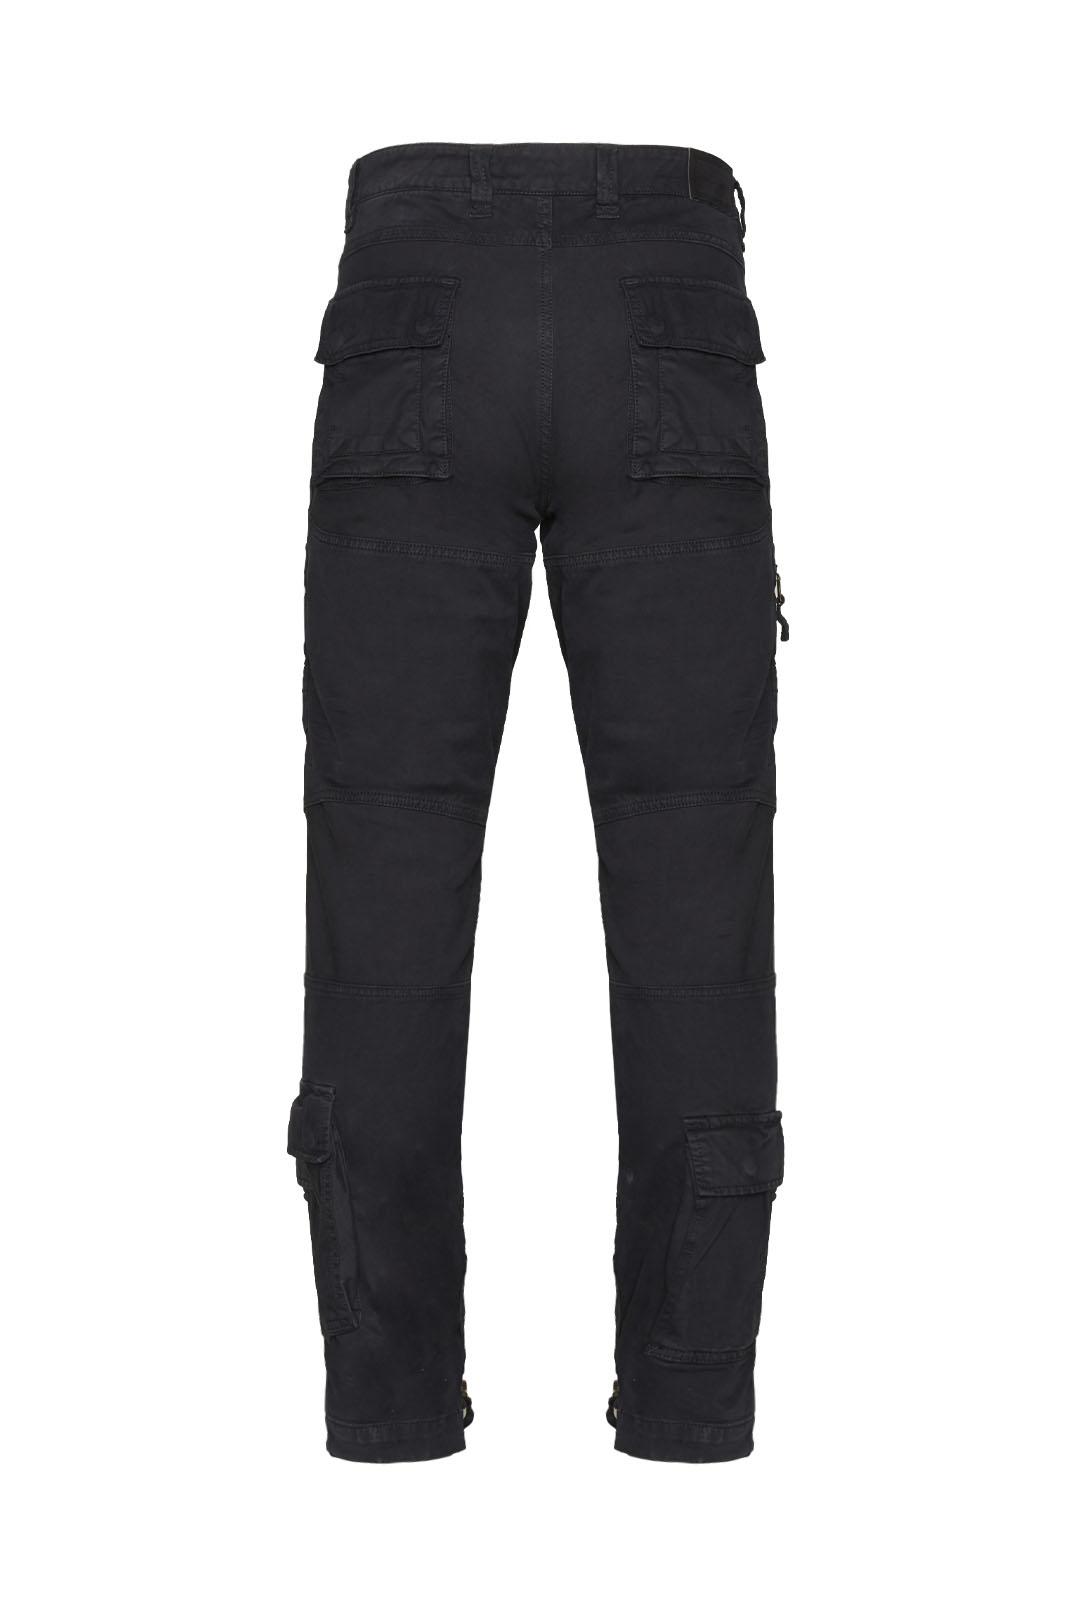 Pantalón Anti-G                          2